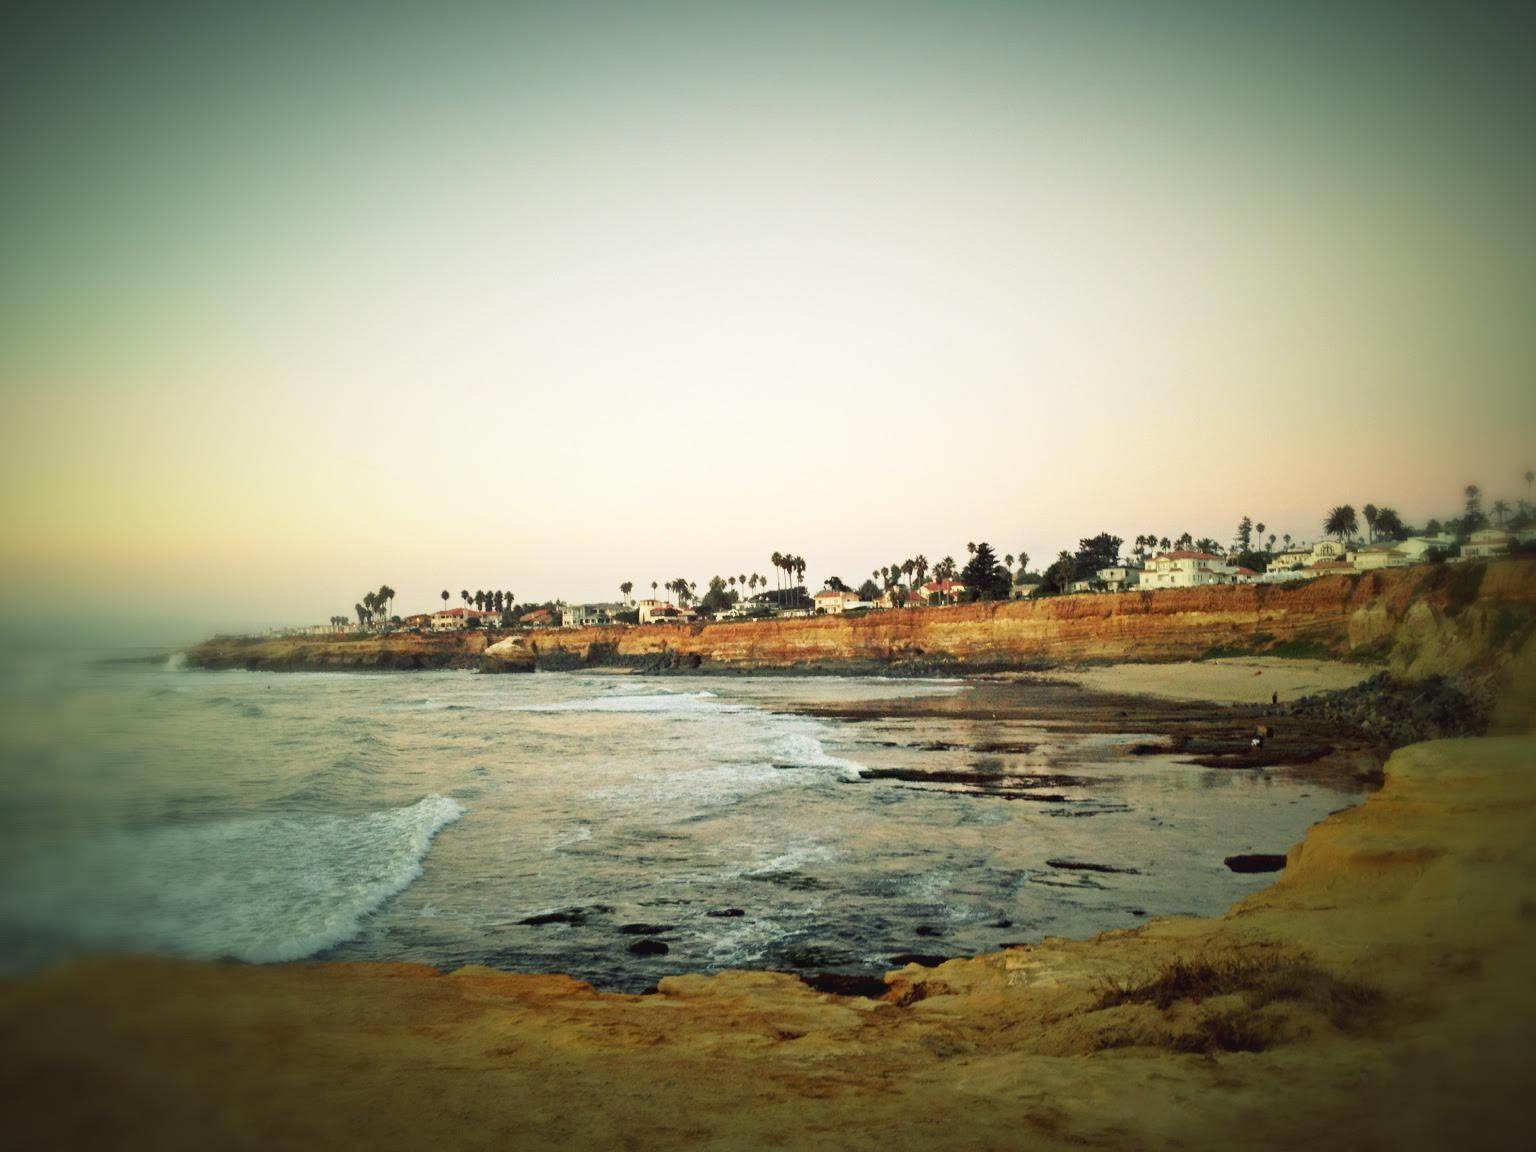 point-loma-sunset-cliffs-twilight.jpg